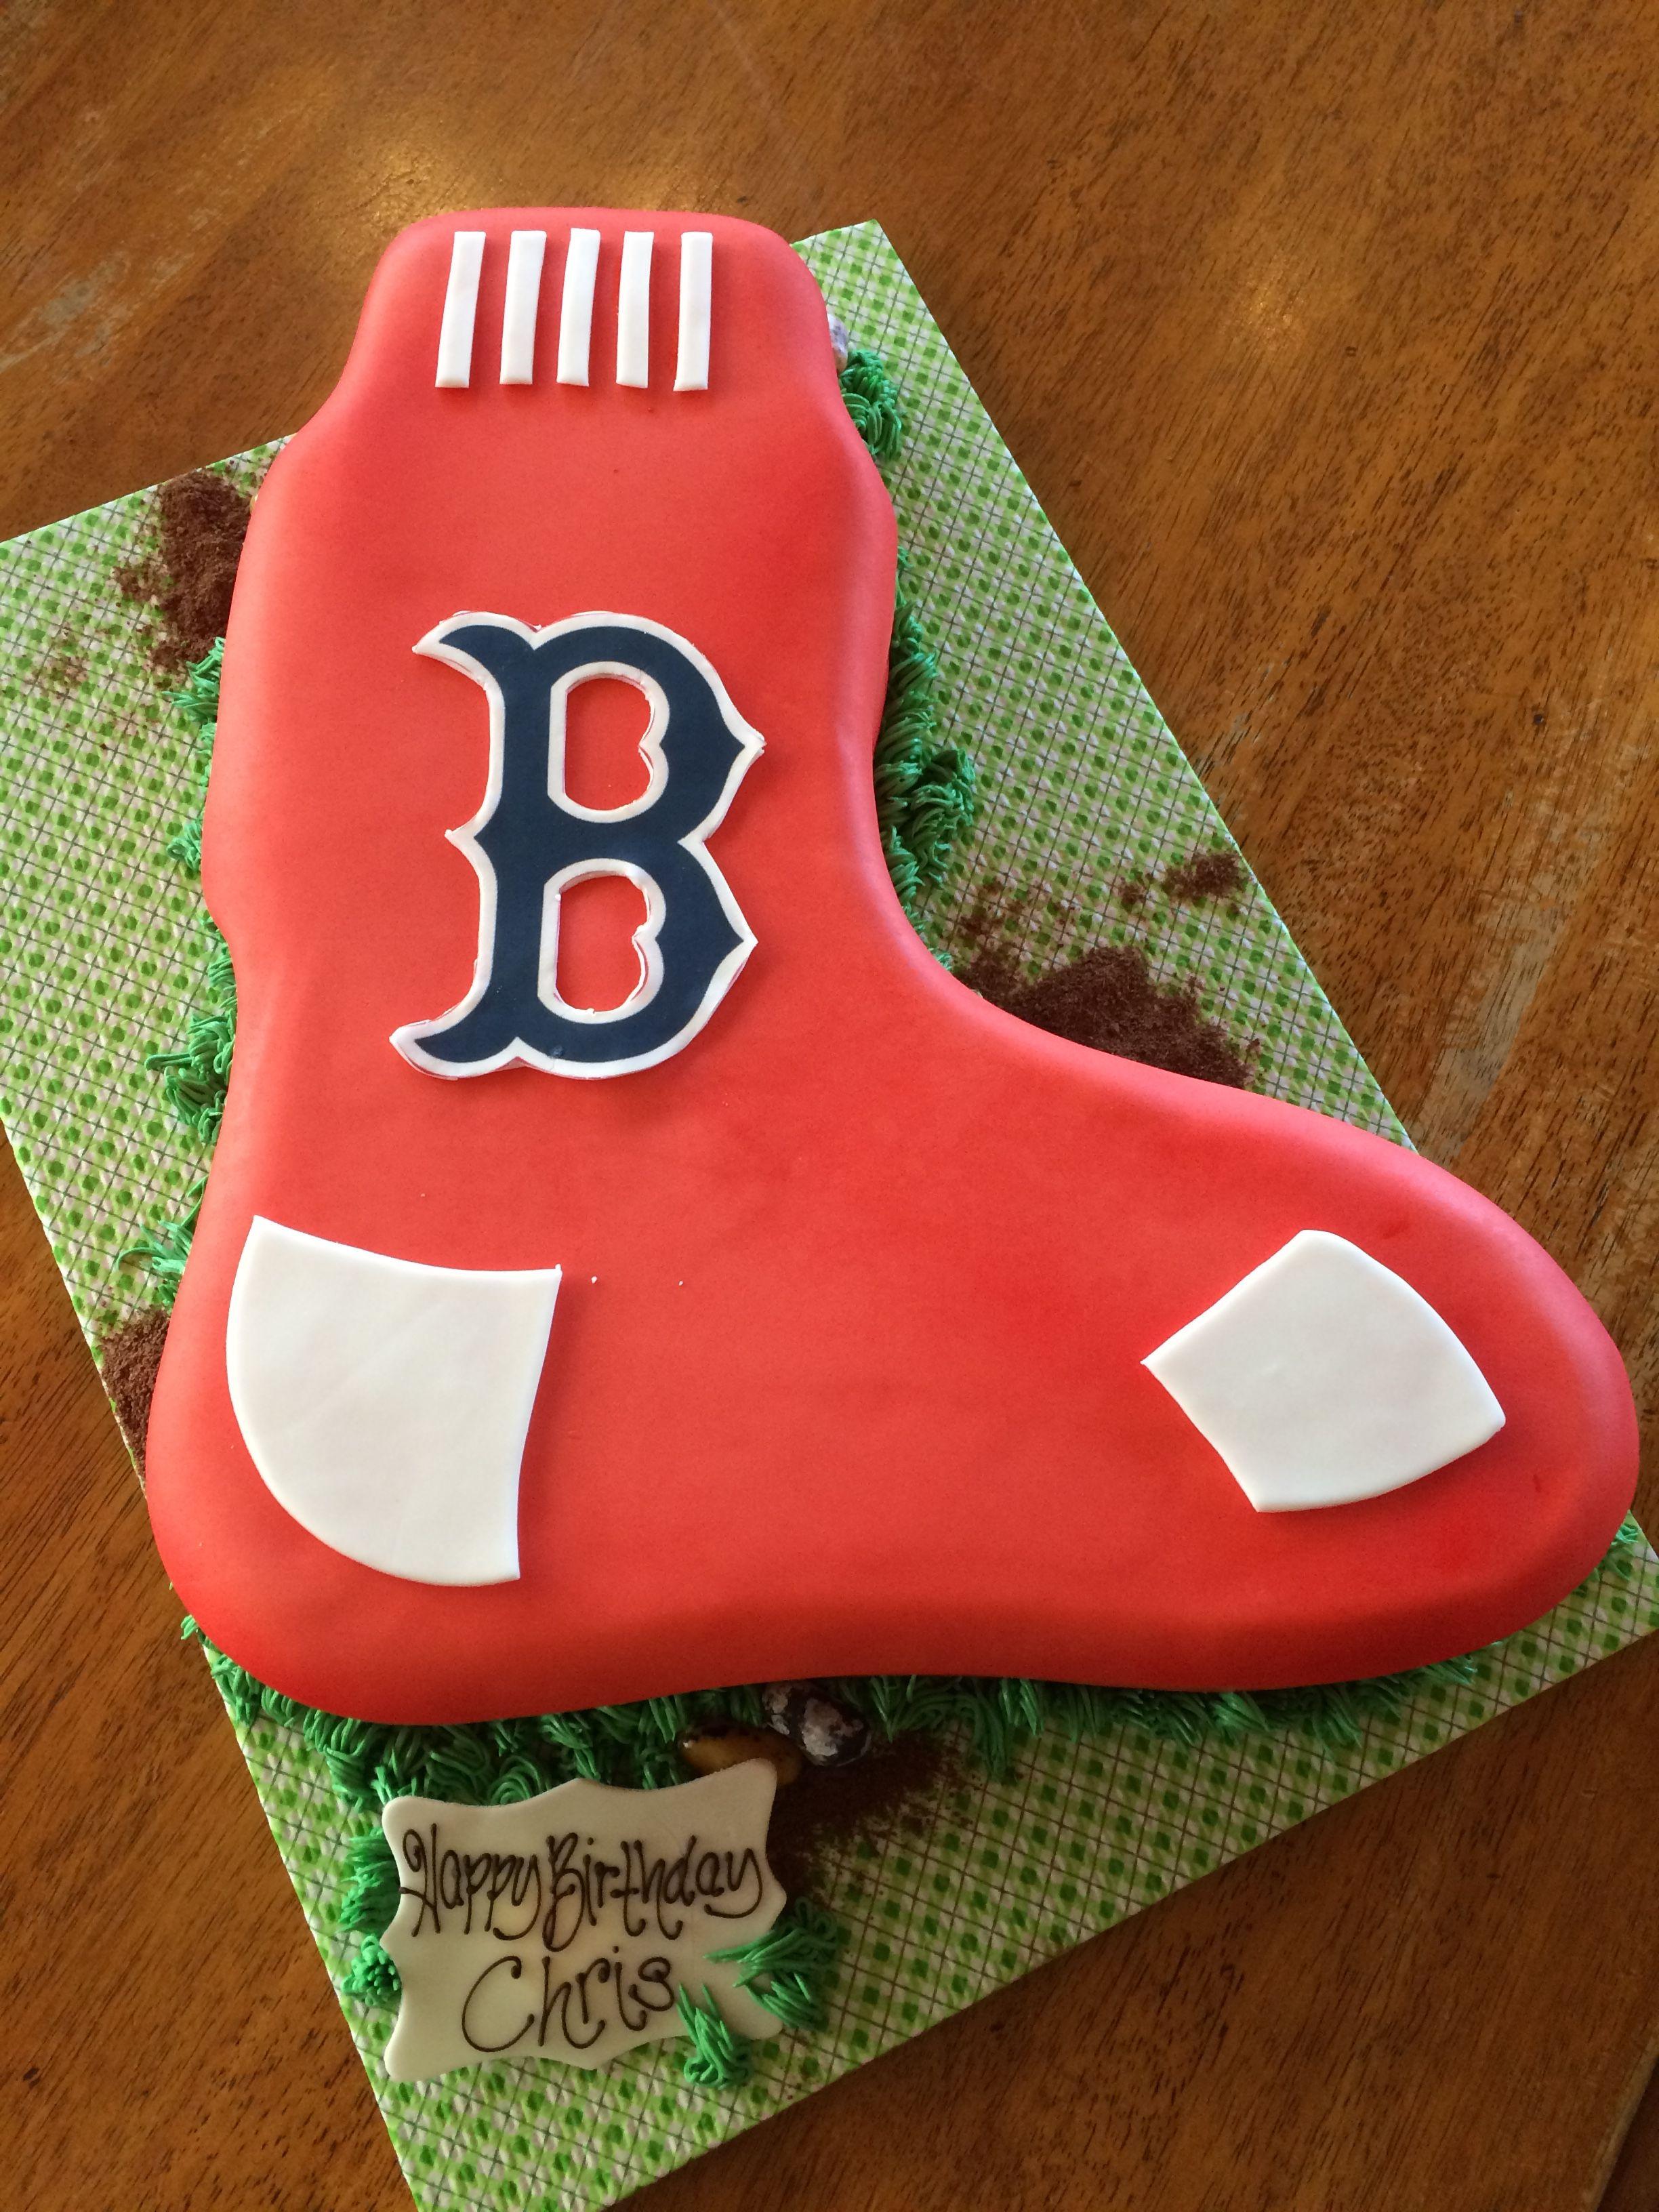 Boston Red Sox shaped birthday cake | Pastry&dessert | Pinterest ...